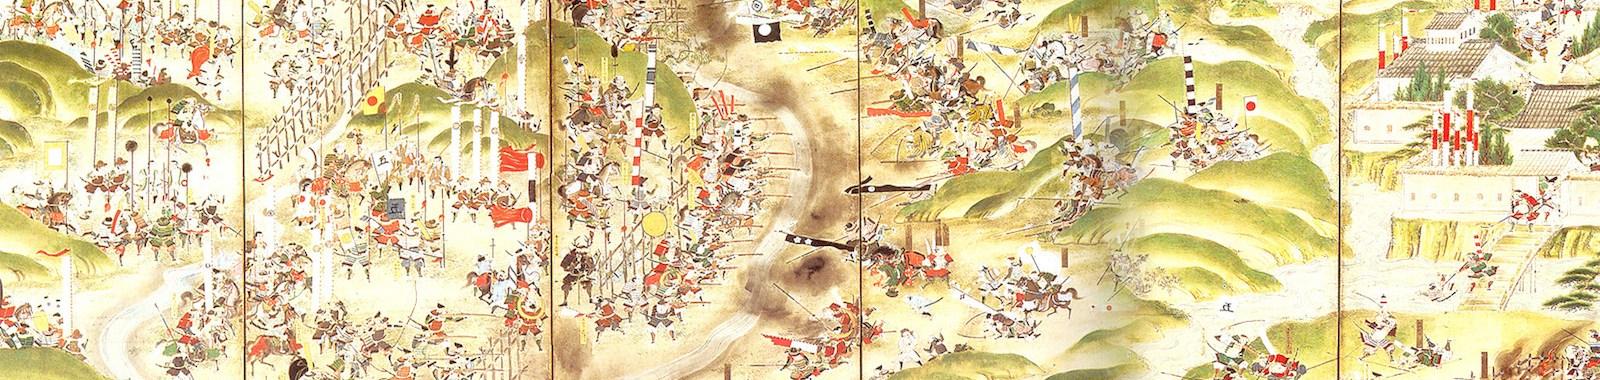 Battle_of_Nagashino_eye